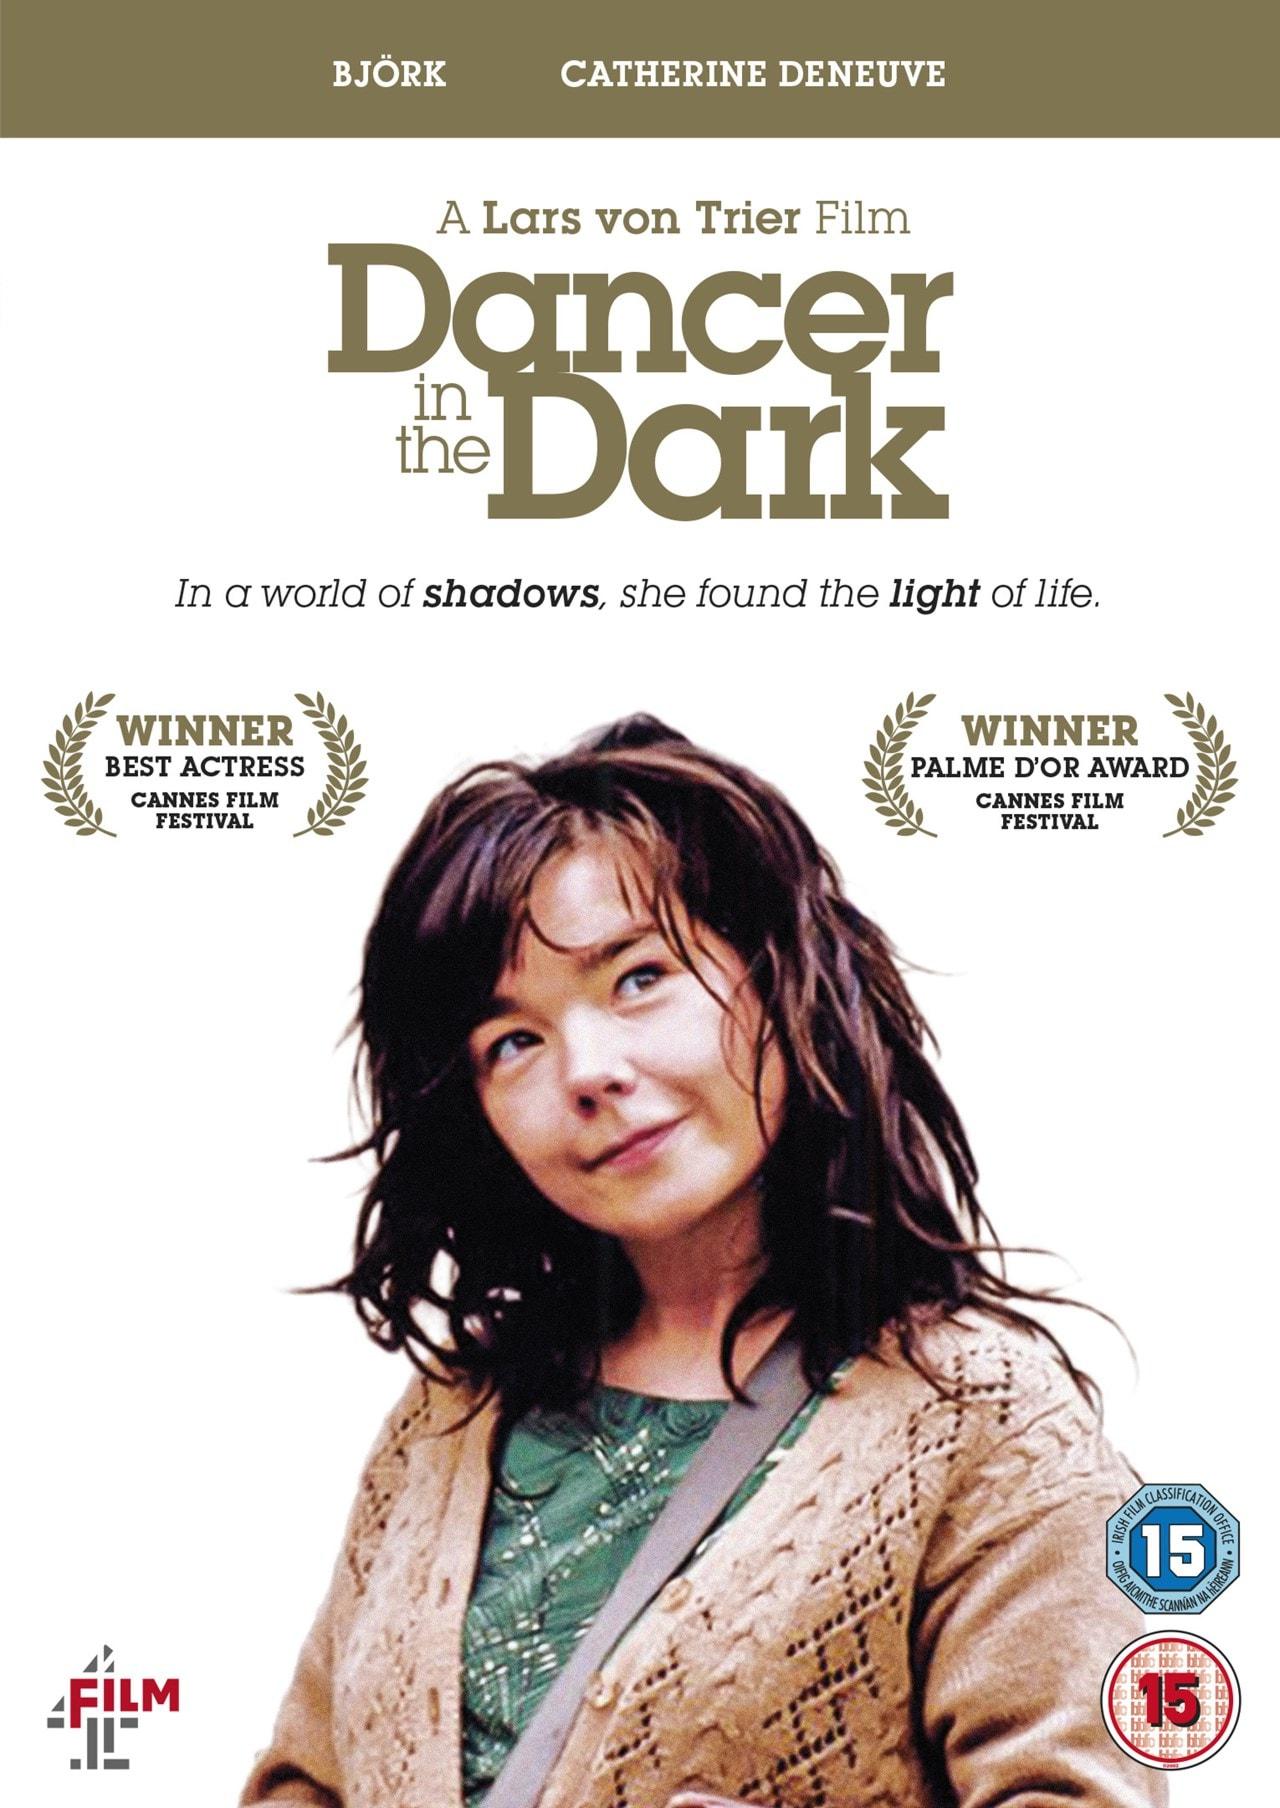 Dancer In The Dark Dvd Free Shipping Over 20 Hmv Store